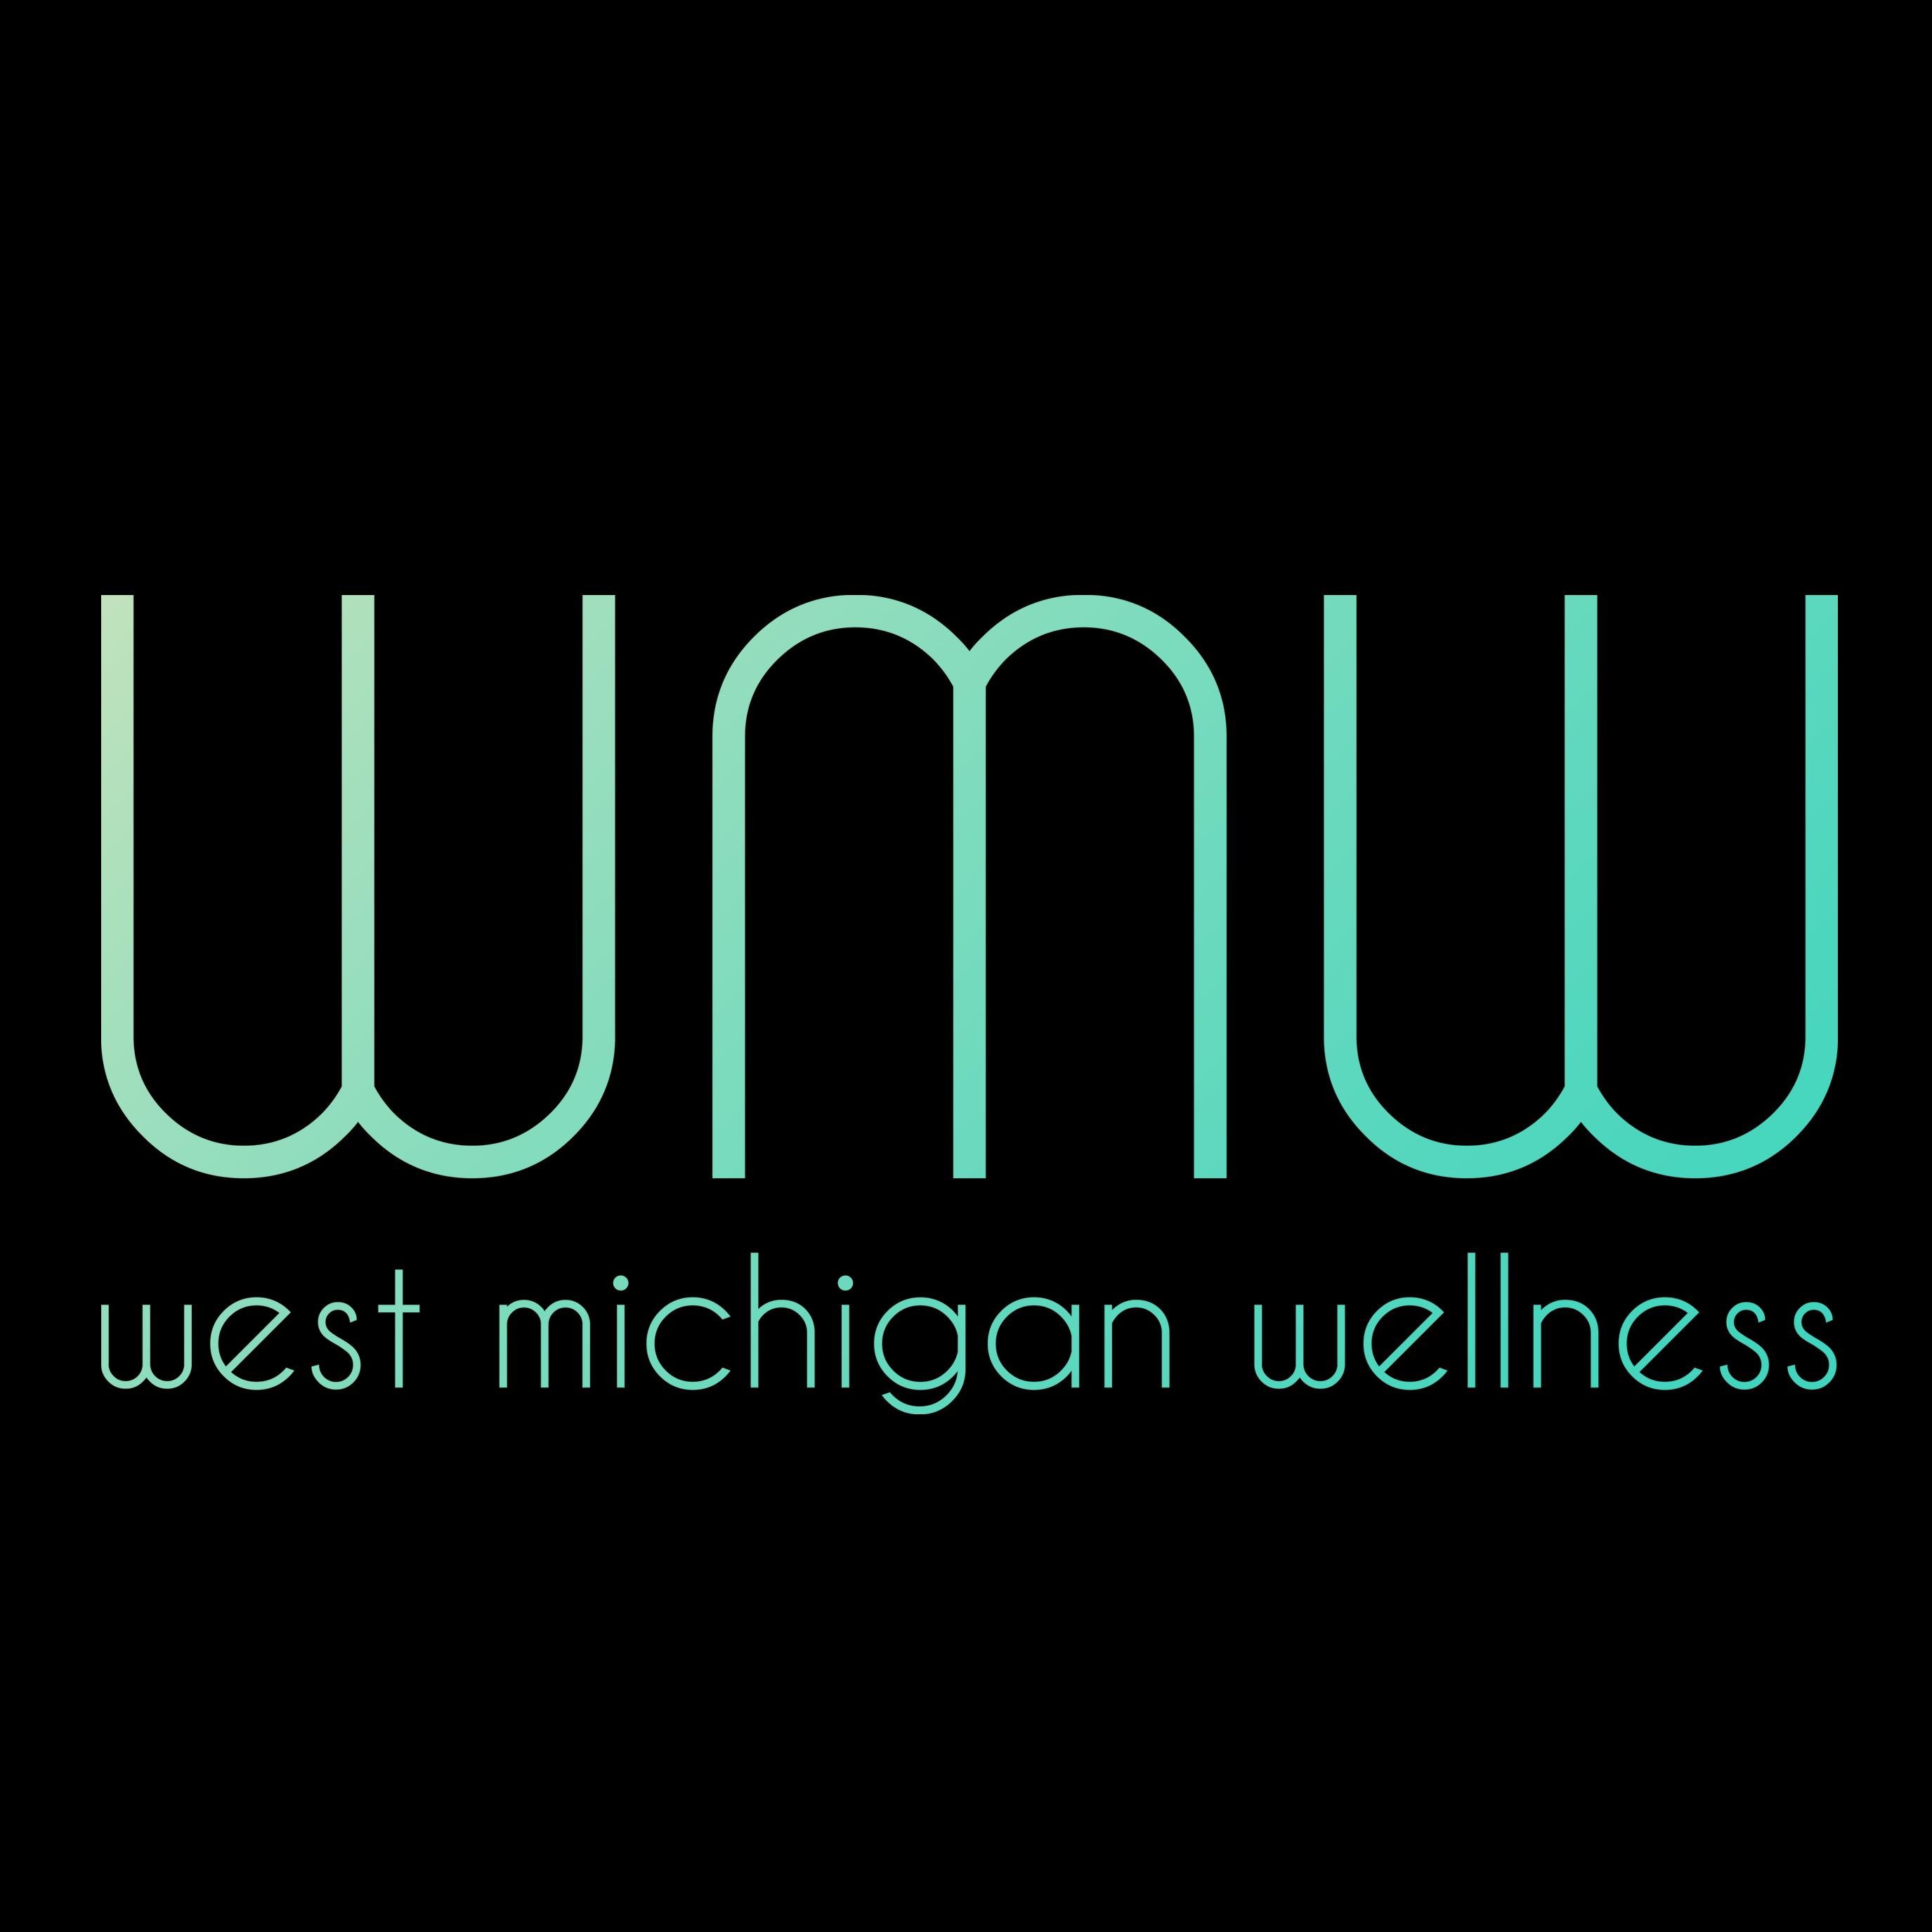 West Michigan Wellness